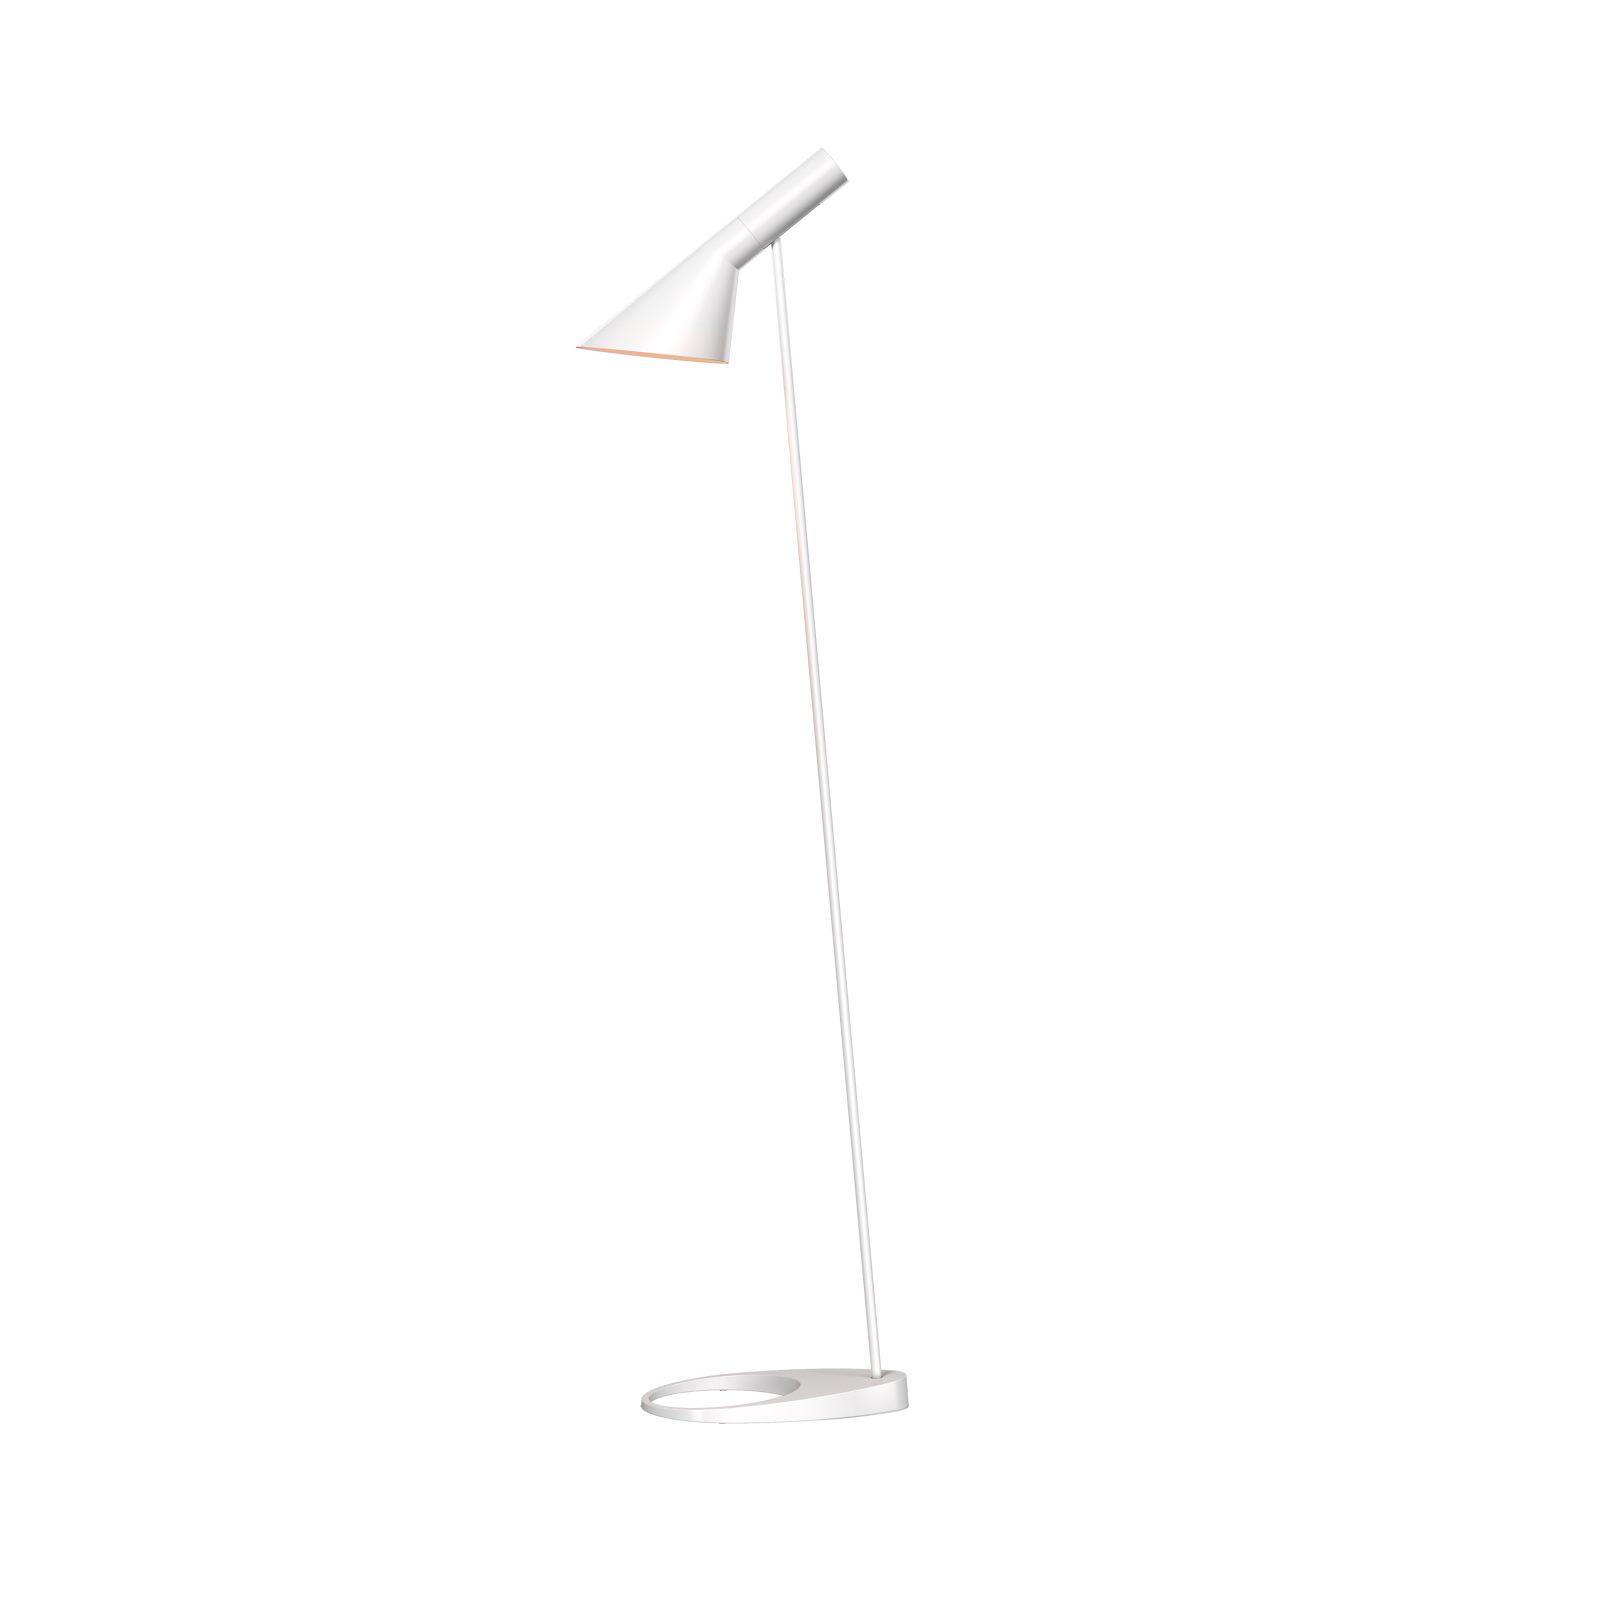 Louis Poulsen Aj Floor Lamp Now Available At Nordic Urban In Berlin